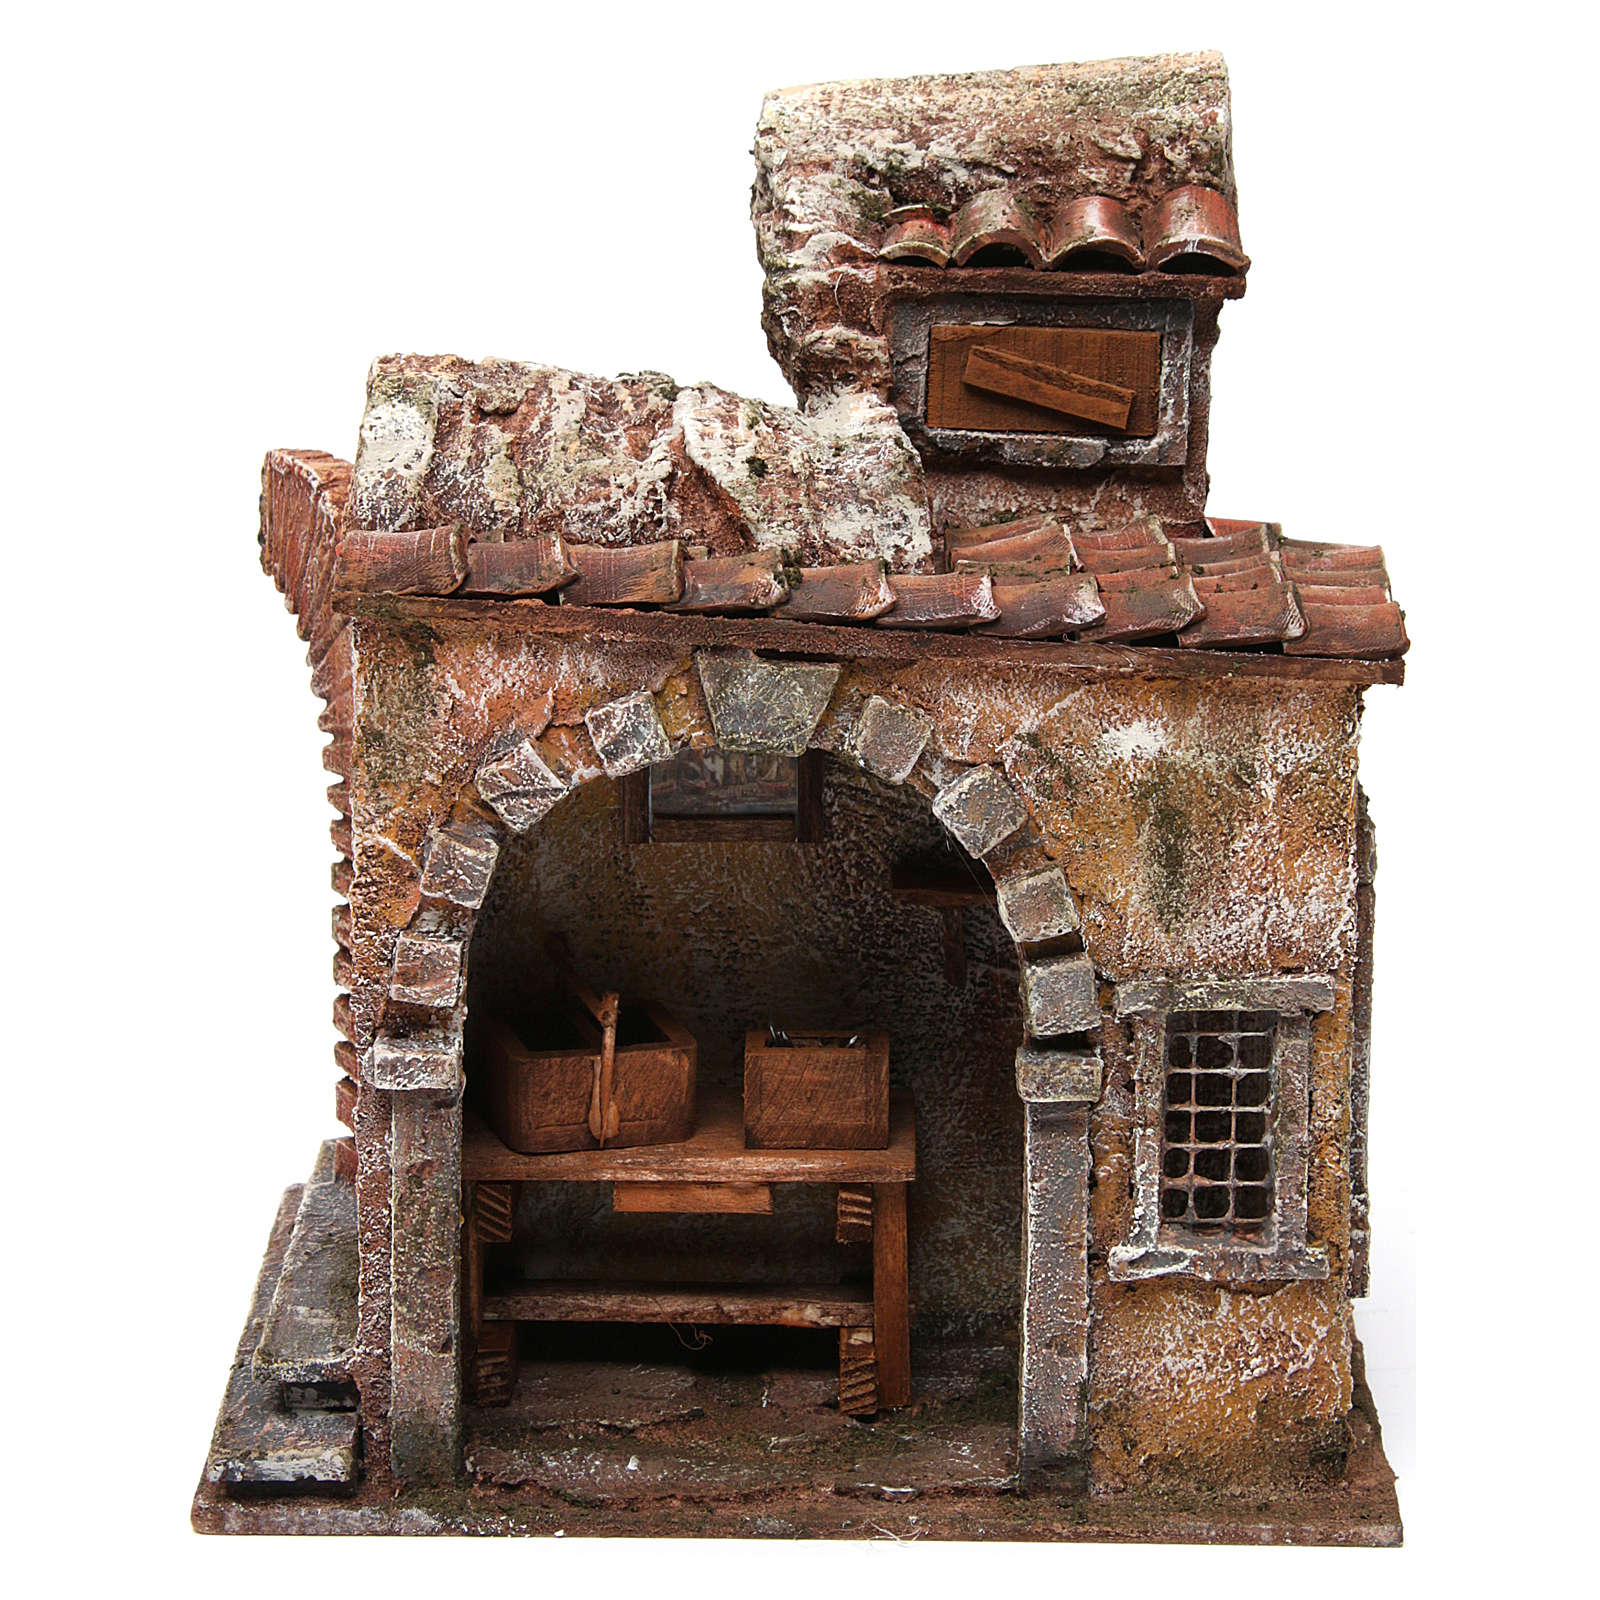 Blacksmith shop for nativity 10cm 4